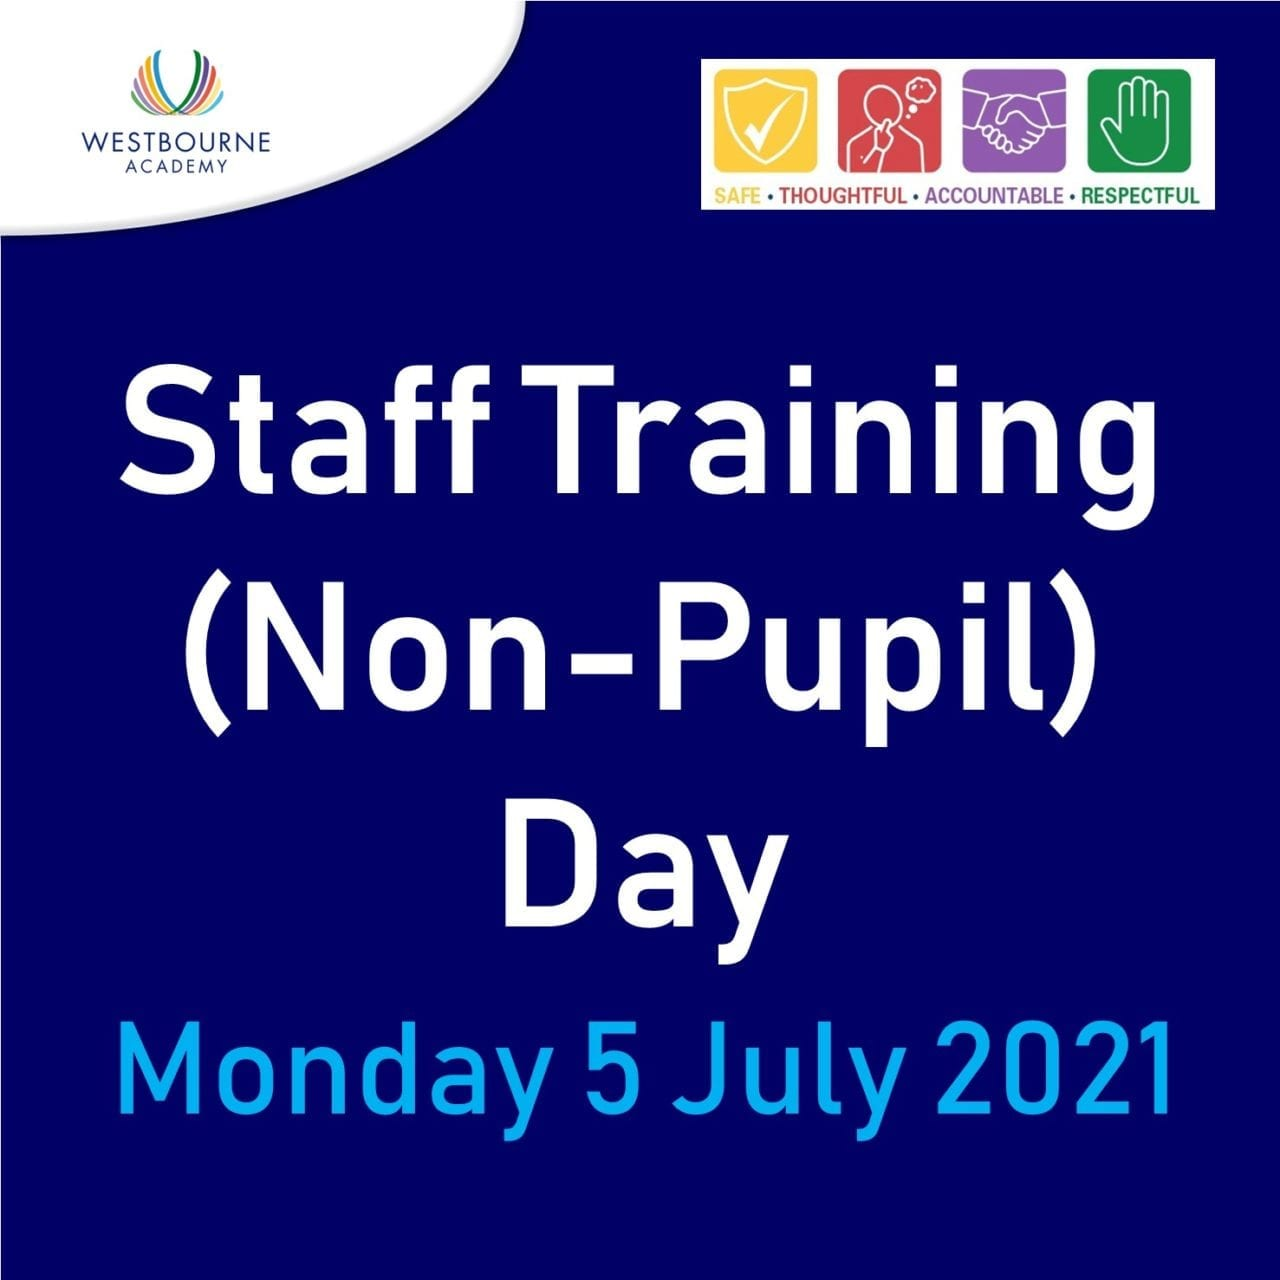 Staff Training Day 5 July 2021